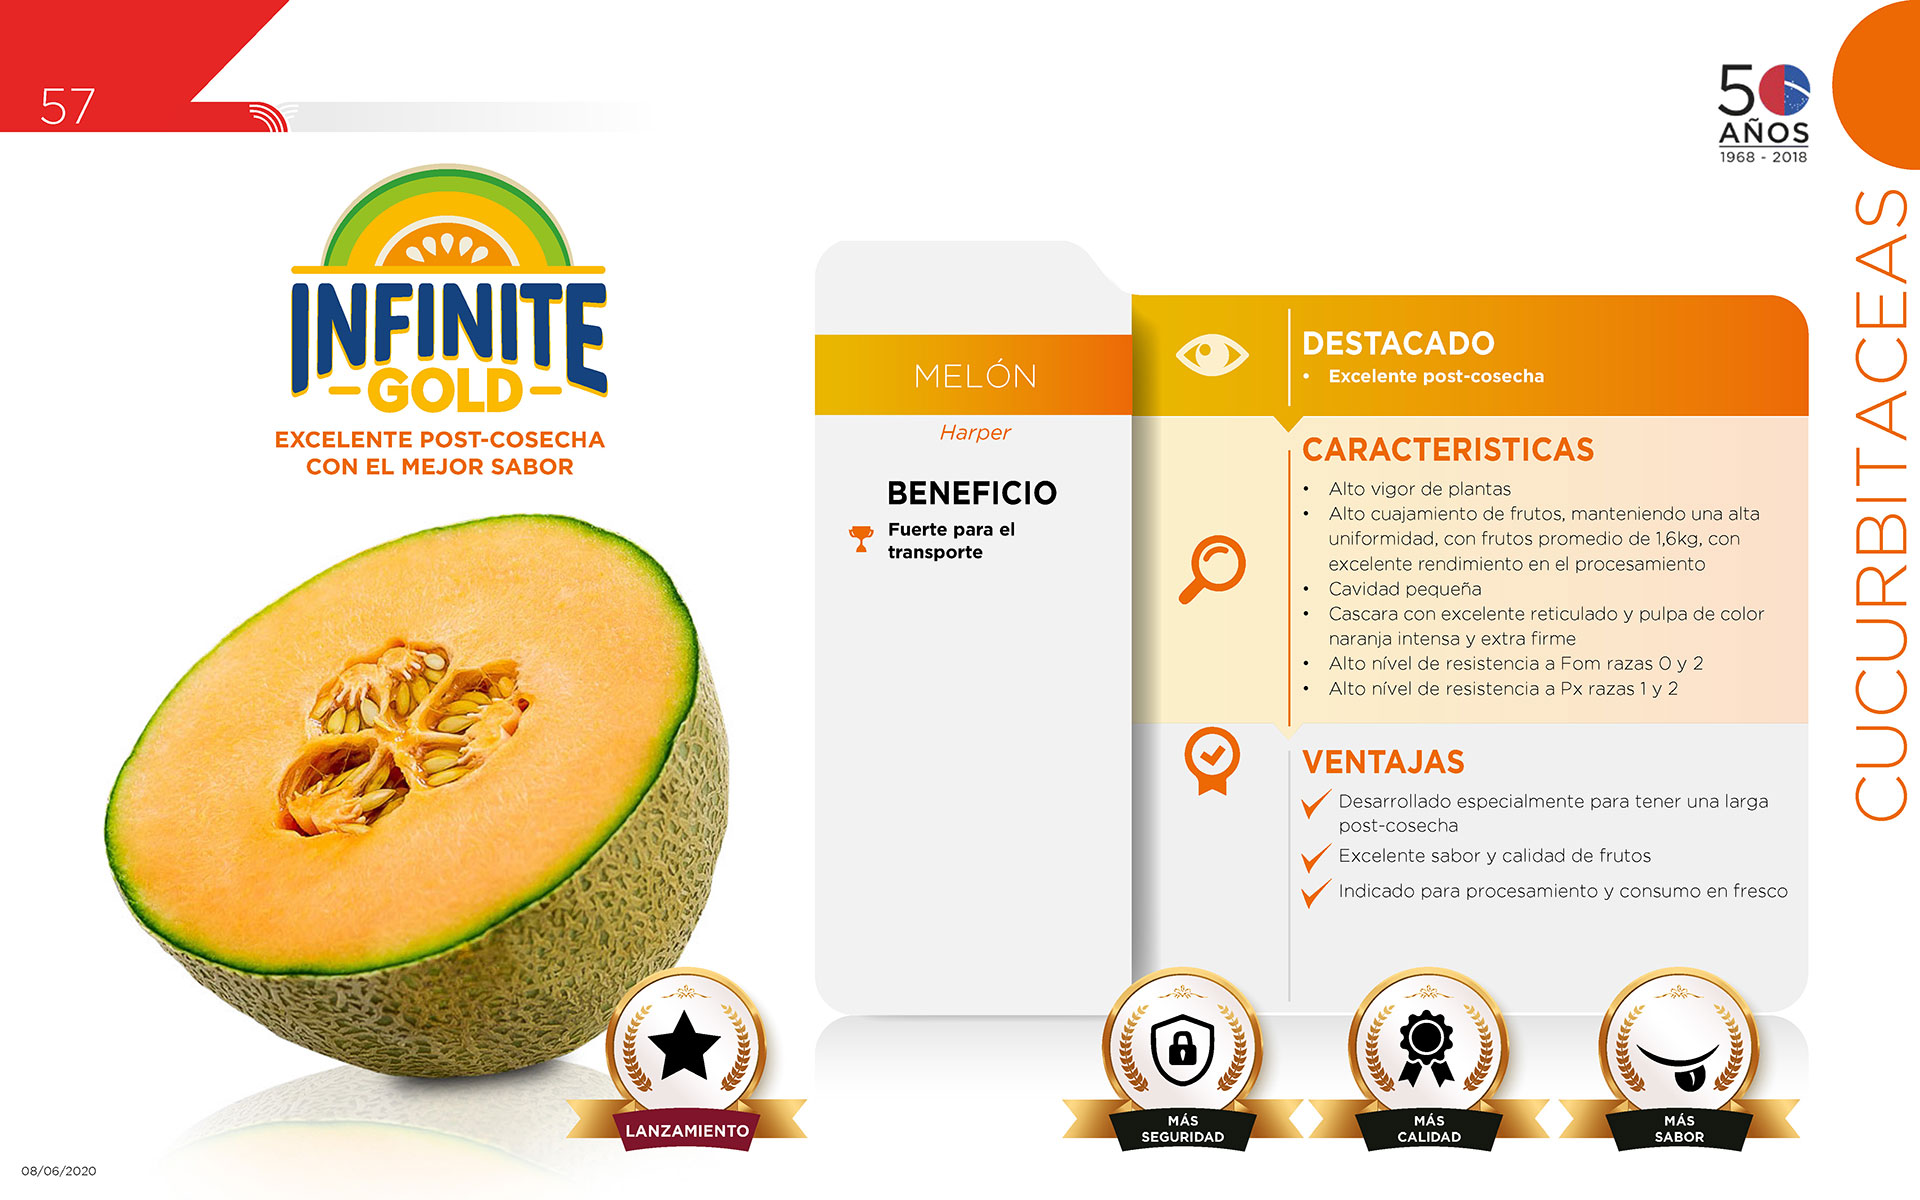 Infinite Gold - Cucurbitaceas